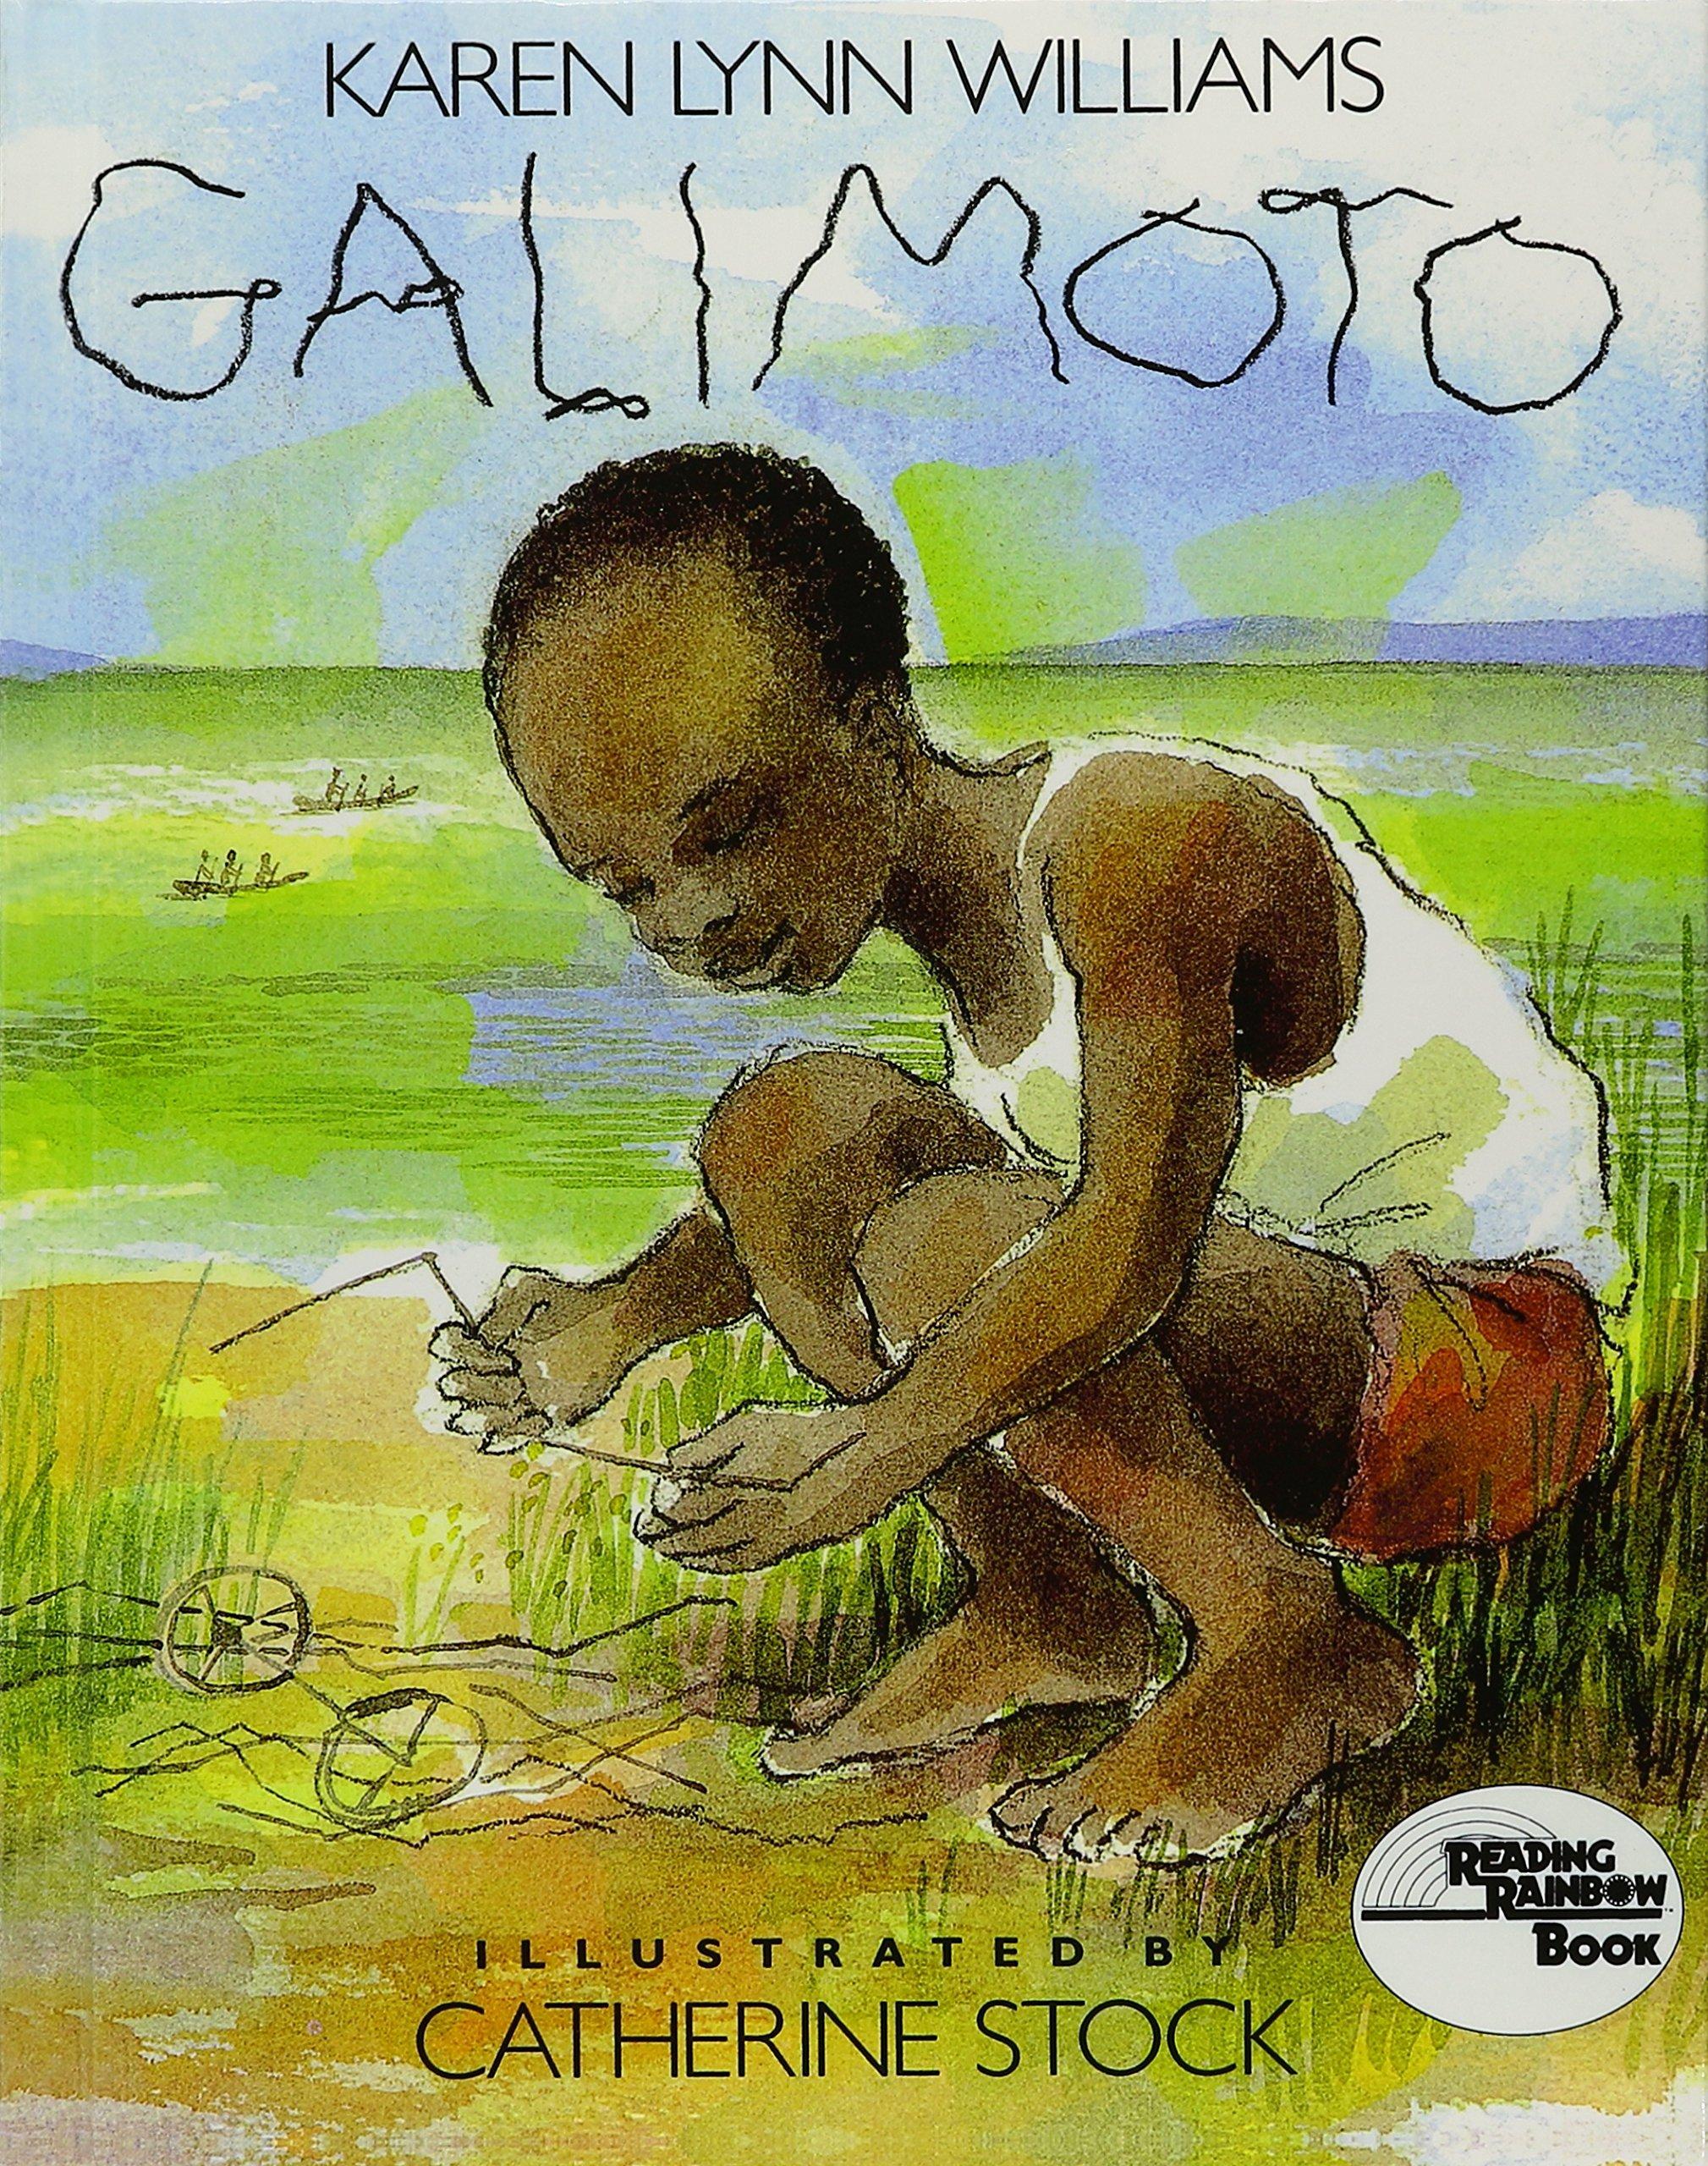 Read Online Galimoto (Reading Rainbow Book) PDF